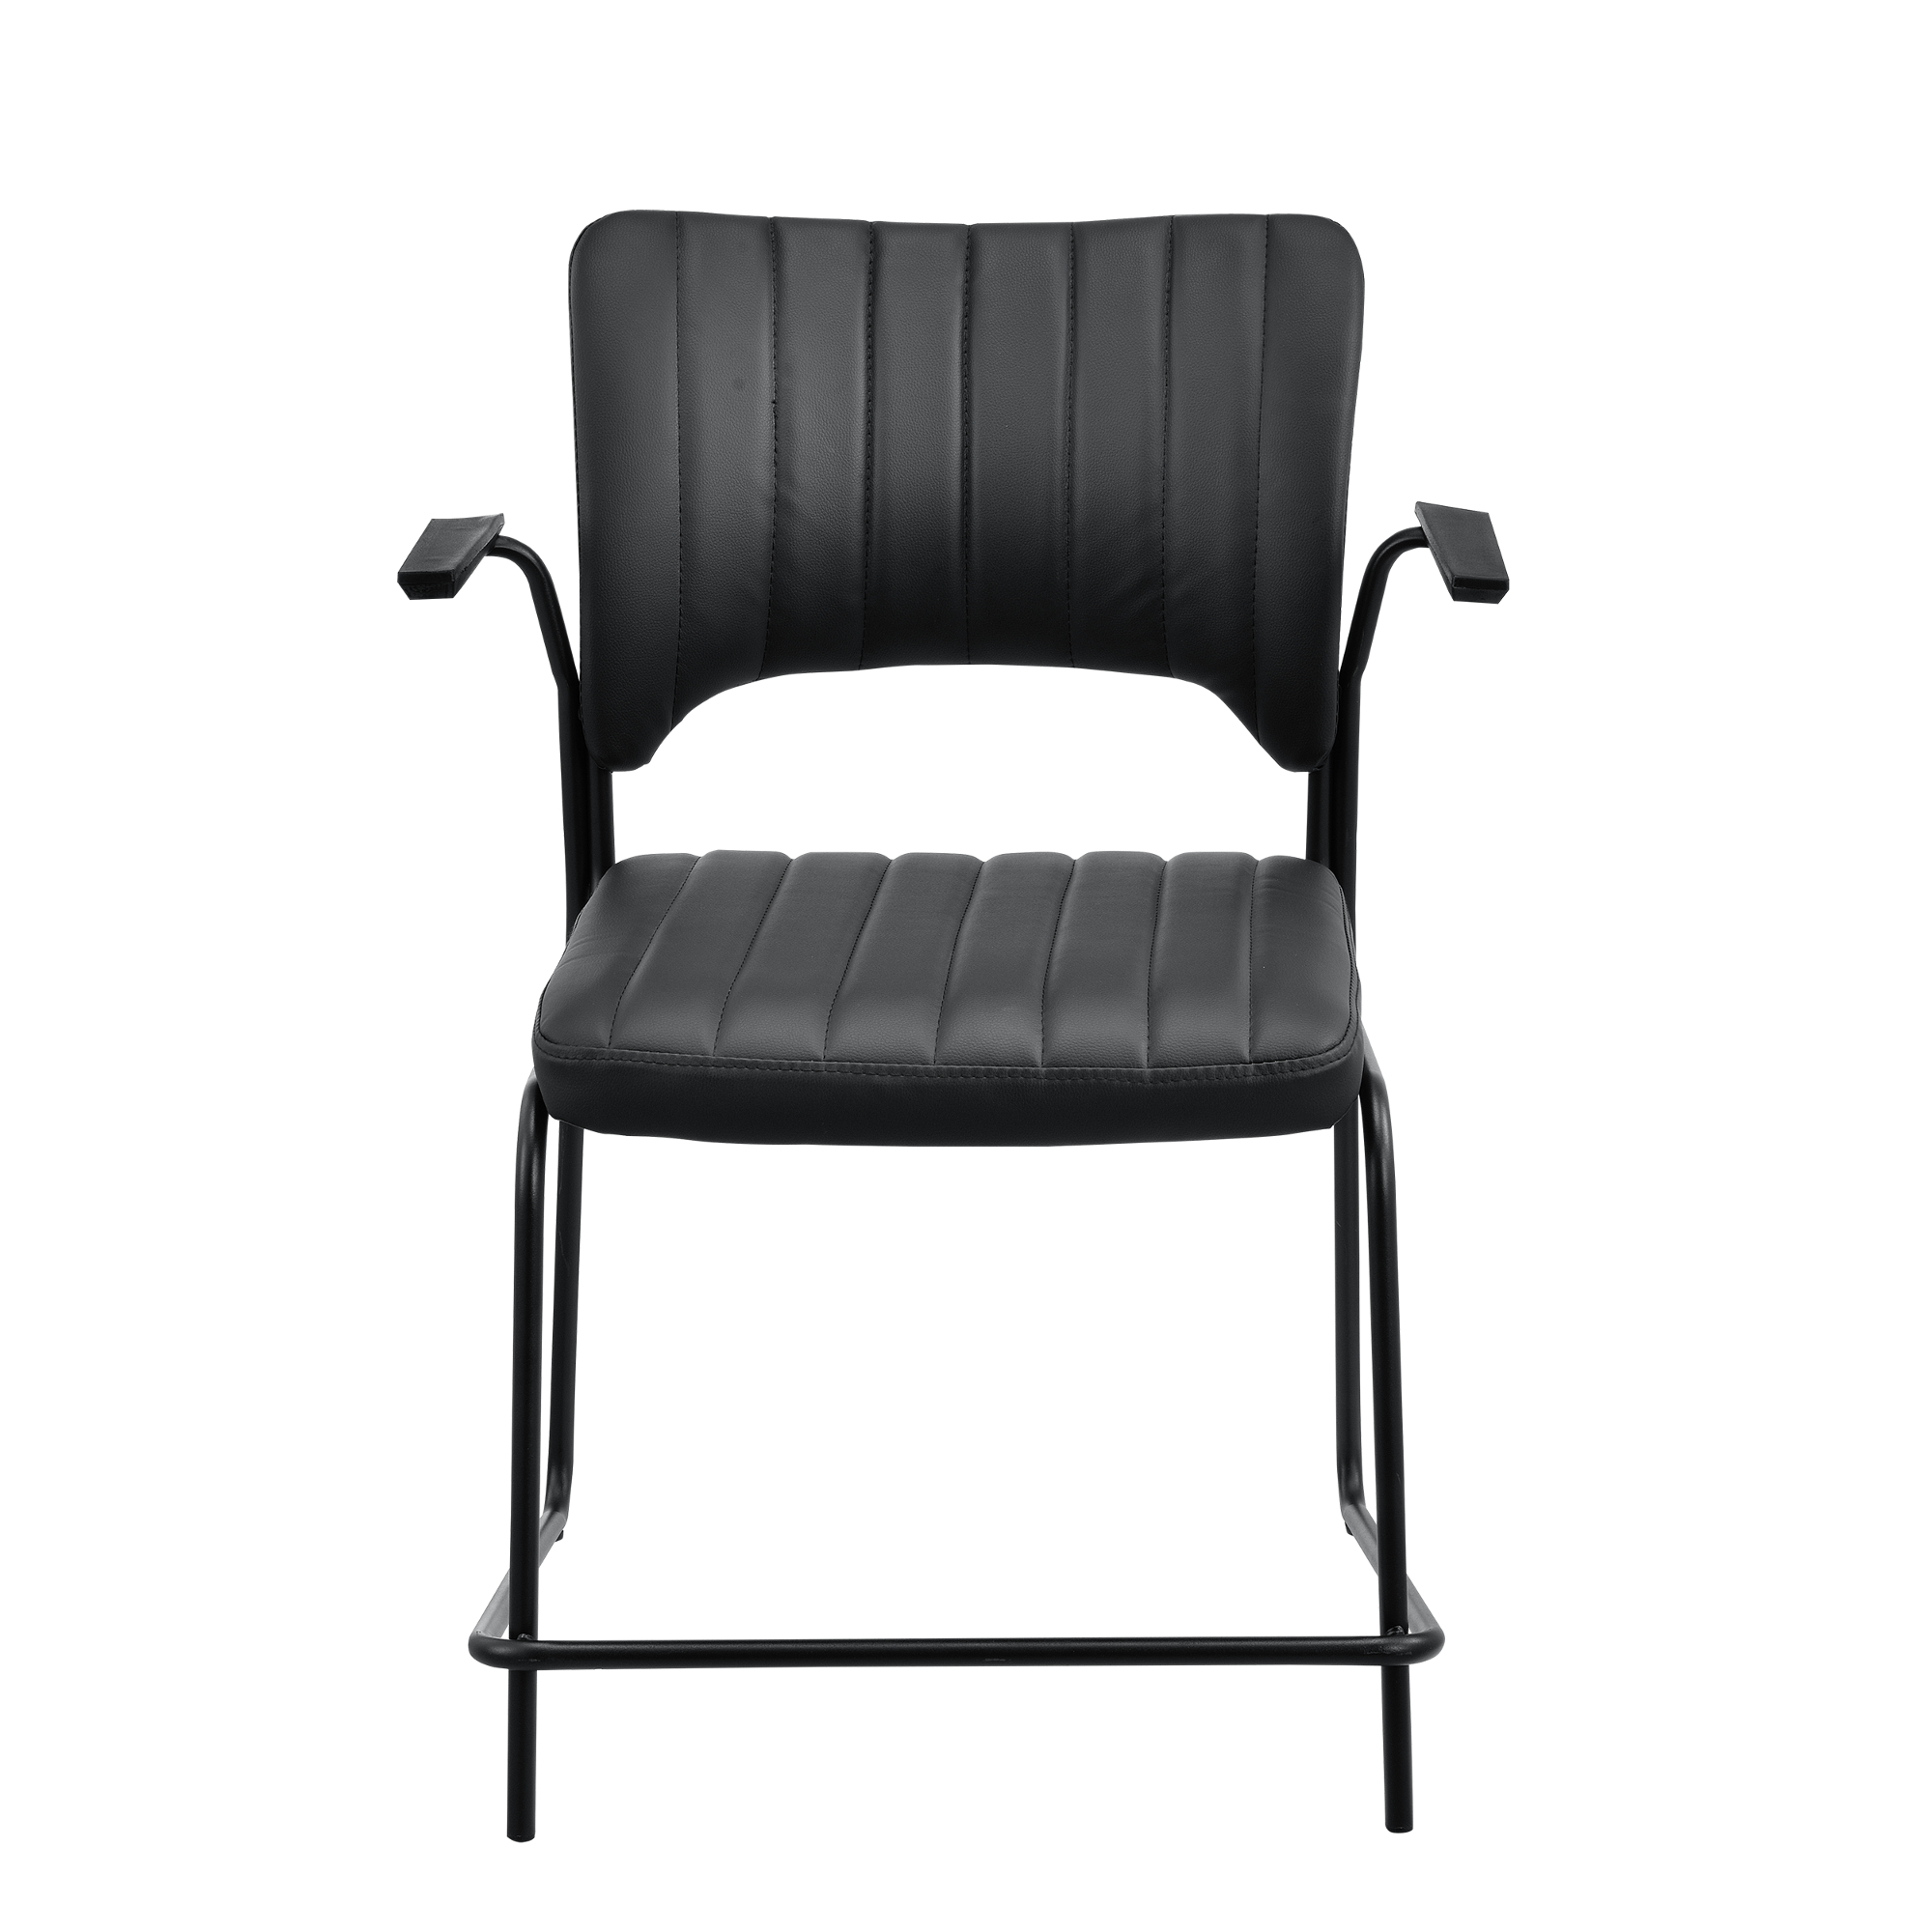 [en.casa]® Konferenzstuhl 2er Set schwarz Besucherstuhl Büro Stuhl Stapelstuhl 4